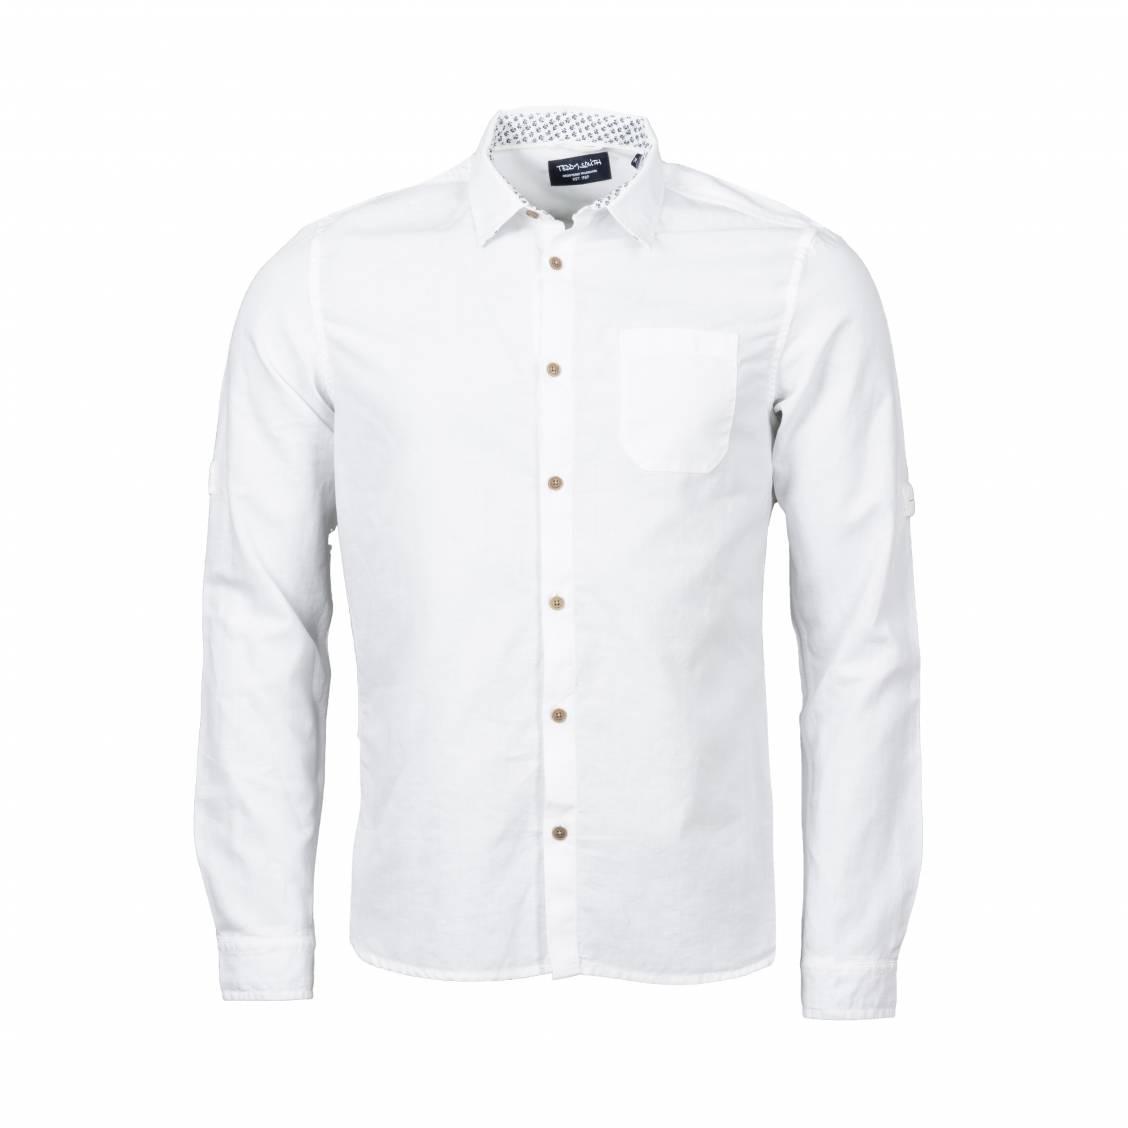 Chemise droite Teddy Smith Ezra en coton et lin blanc